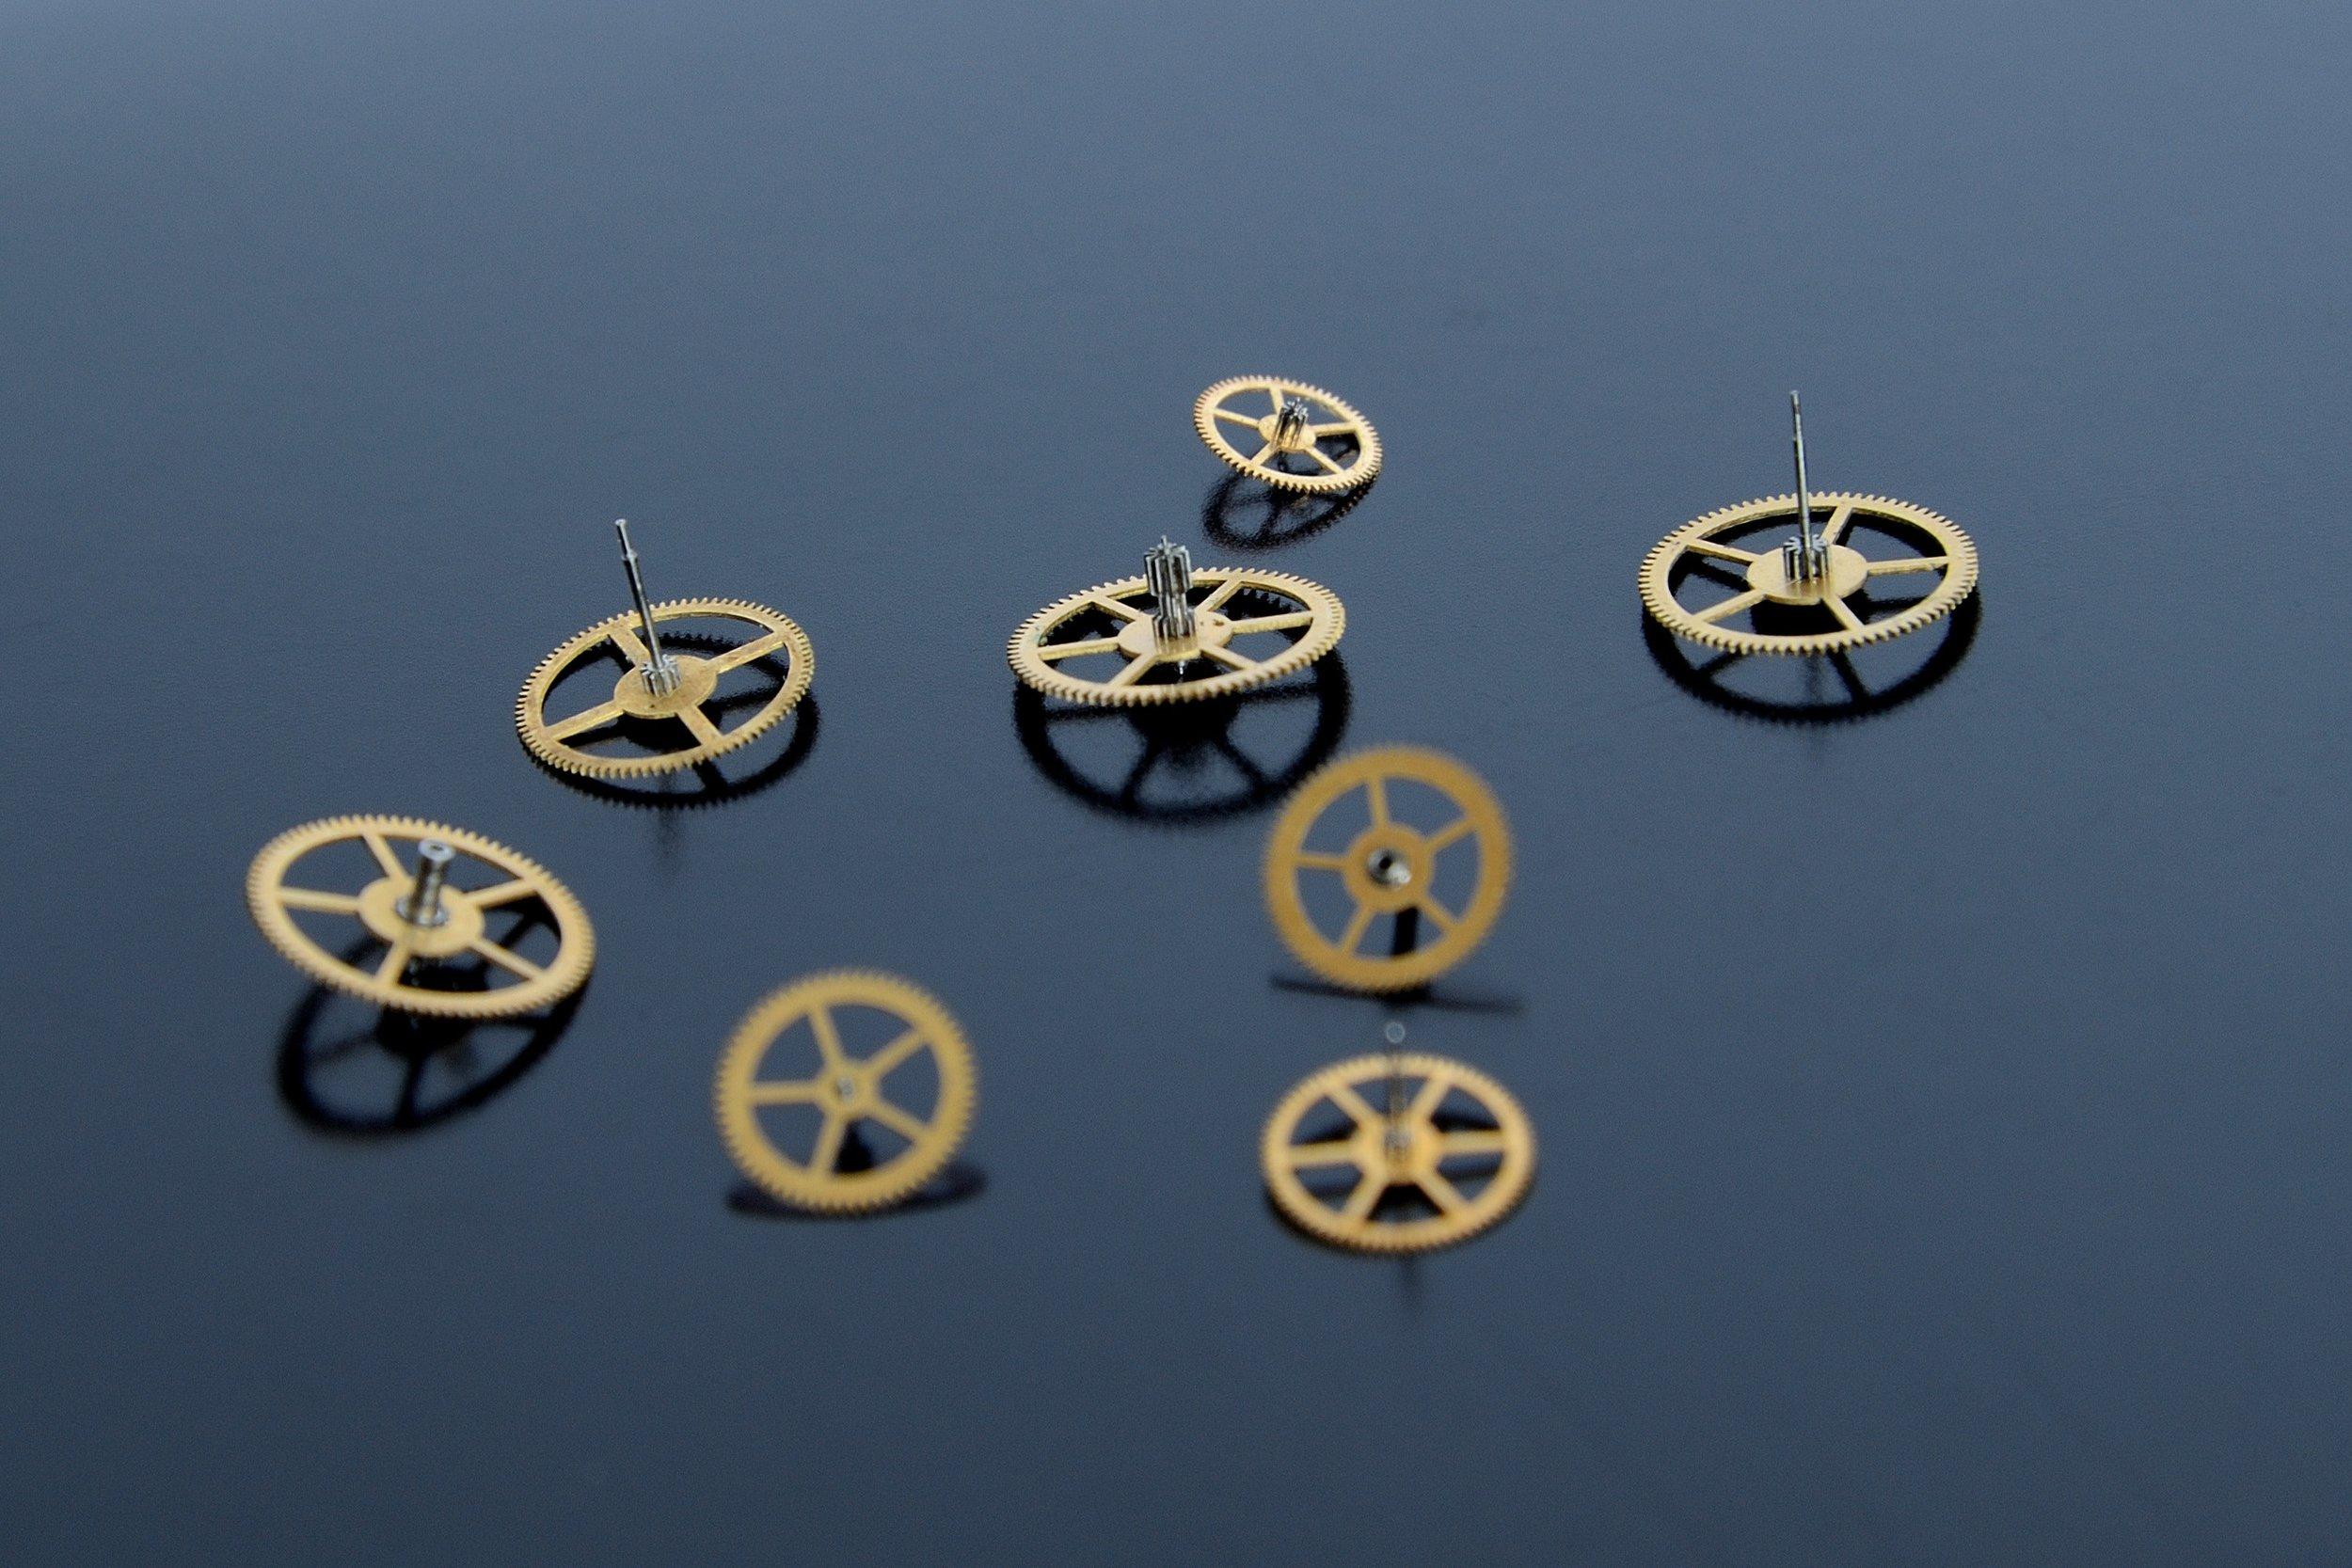 conceptual-equipment-gears-207483.jpg